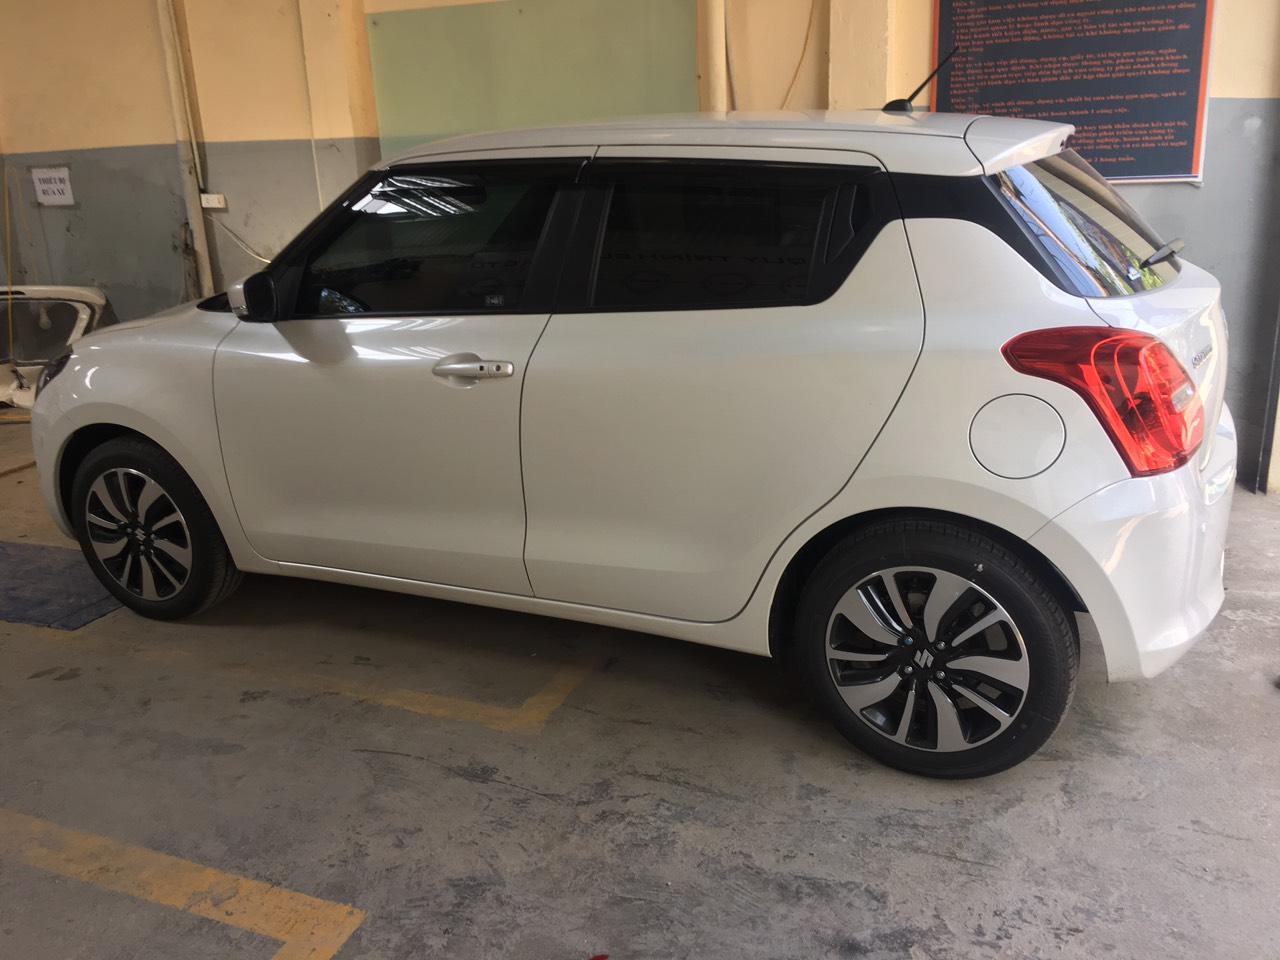 Đổi màu sơn xe ô tô Suzuki Swift